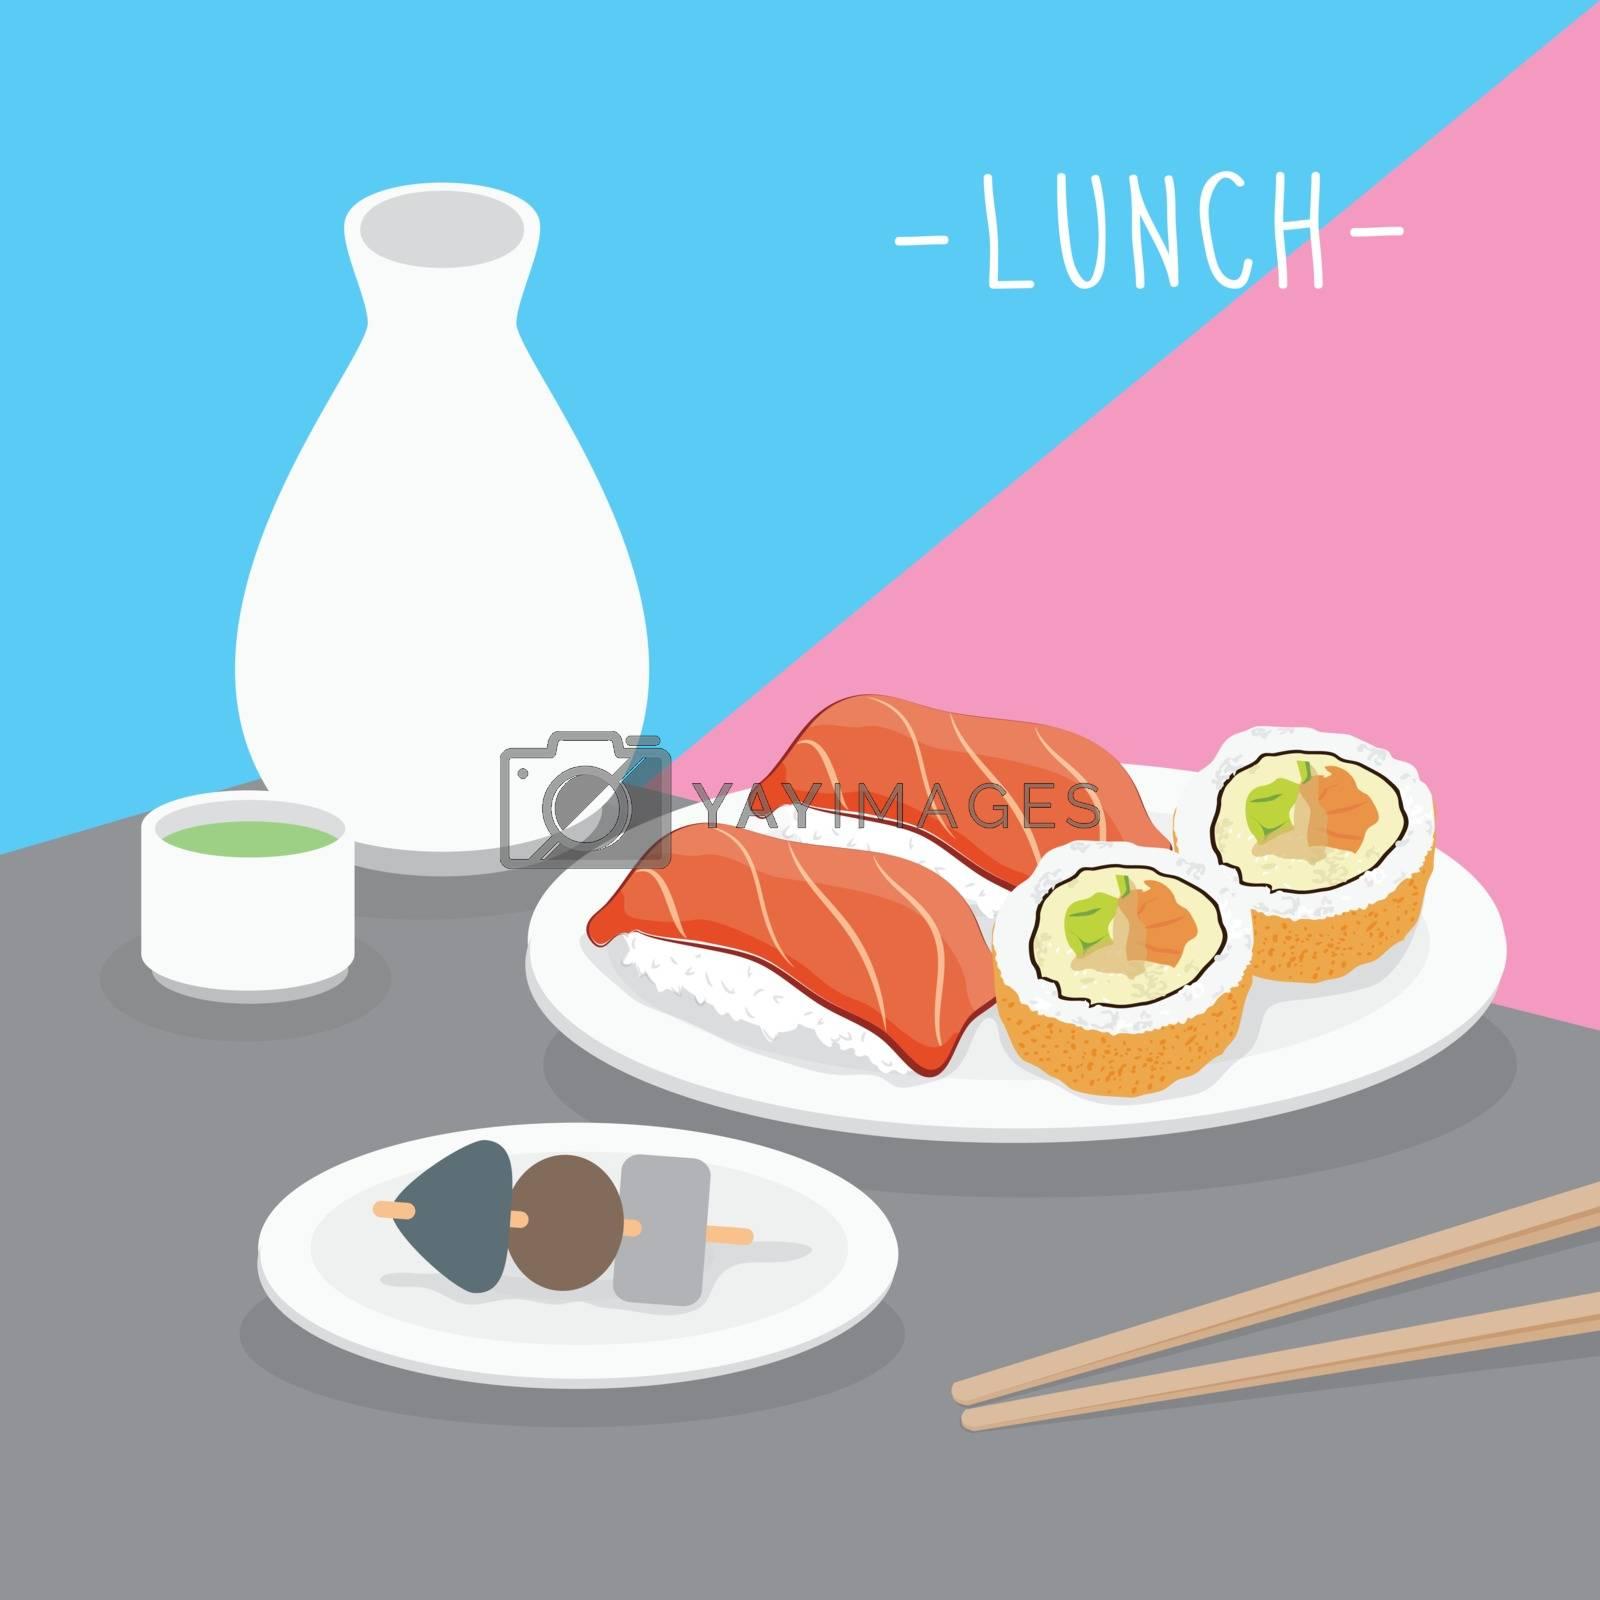 Food Meal Lunch Dairy Eat Drink Menu Restaurant Vector